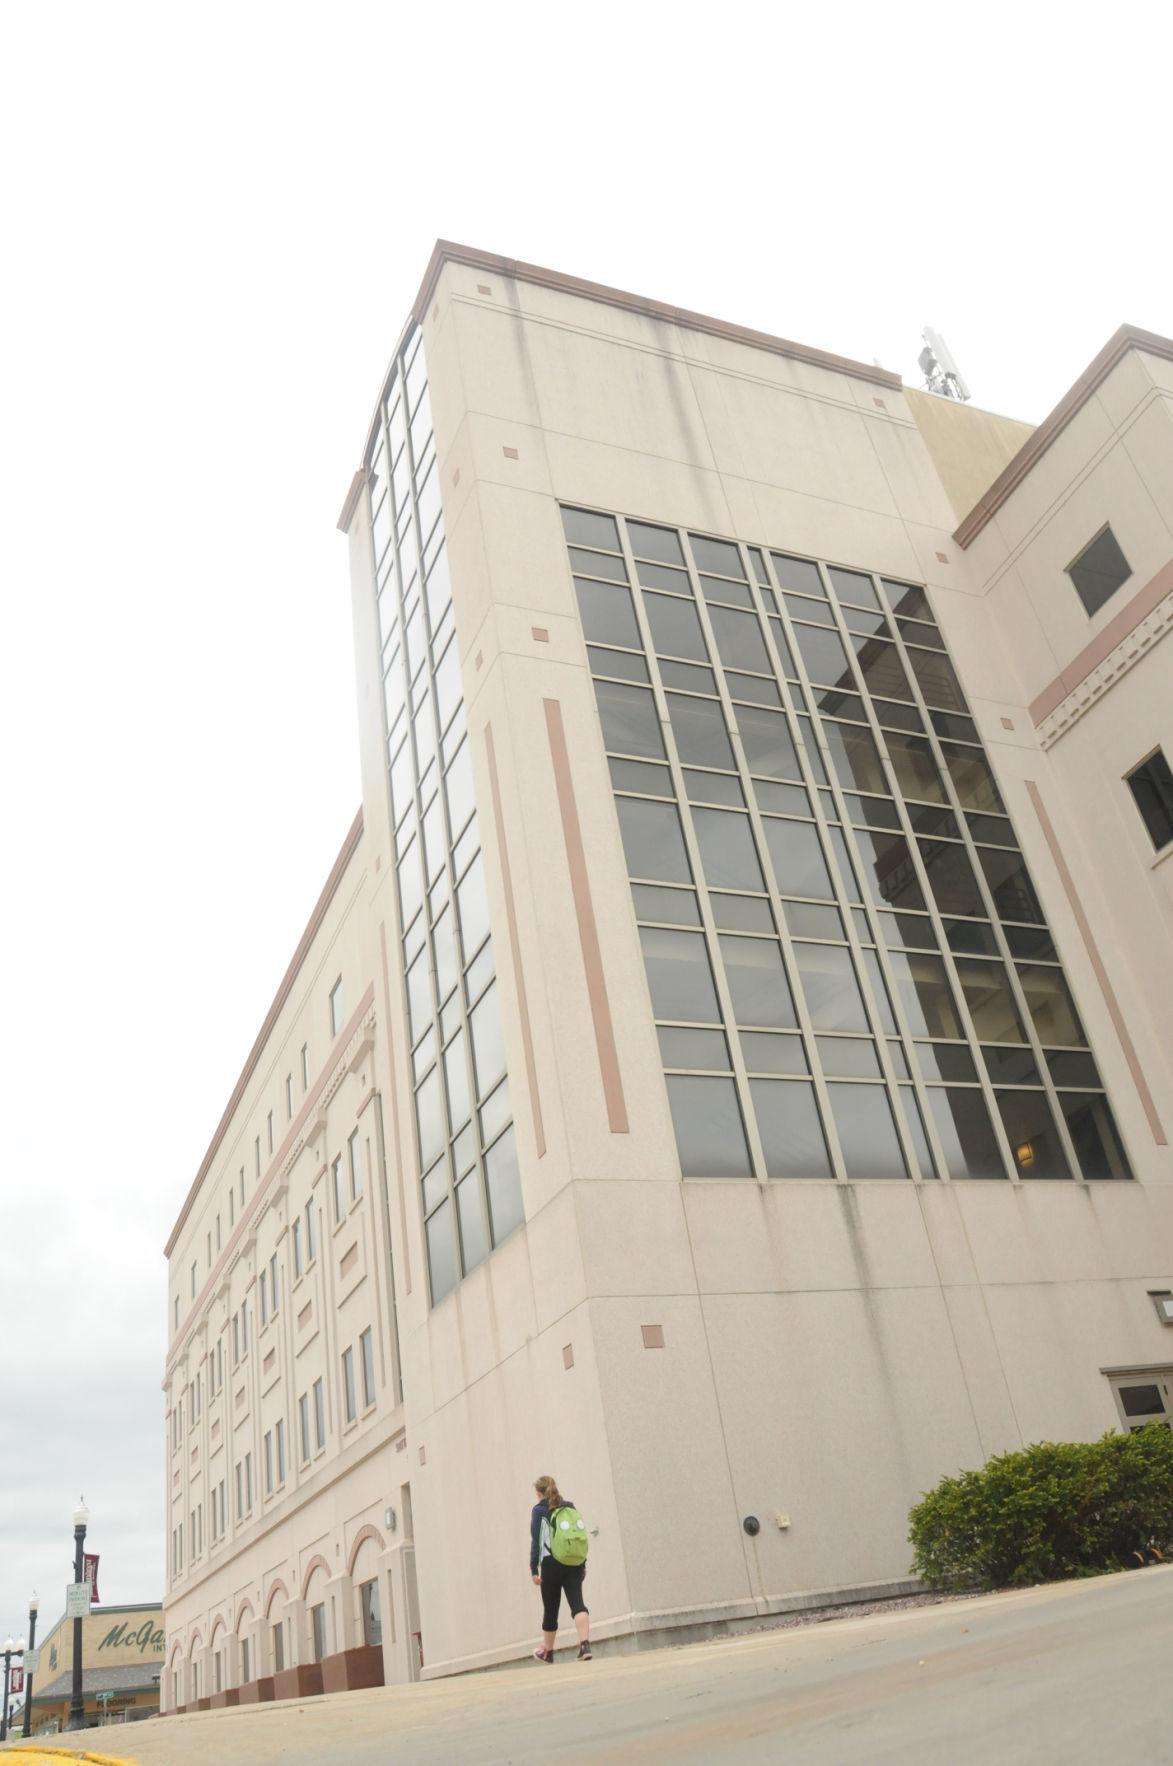 Committee nixes Sauk County mural proposal